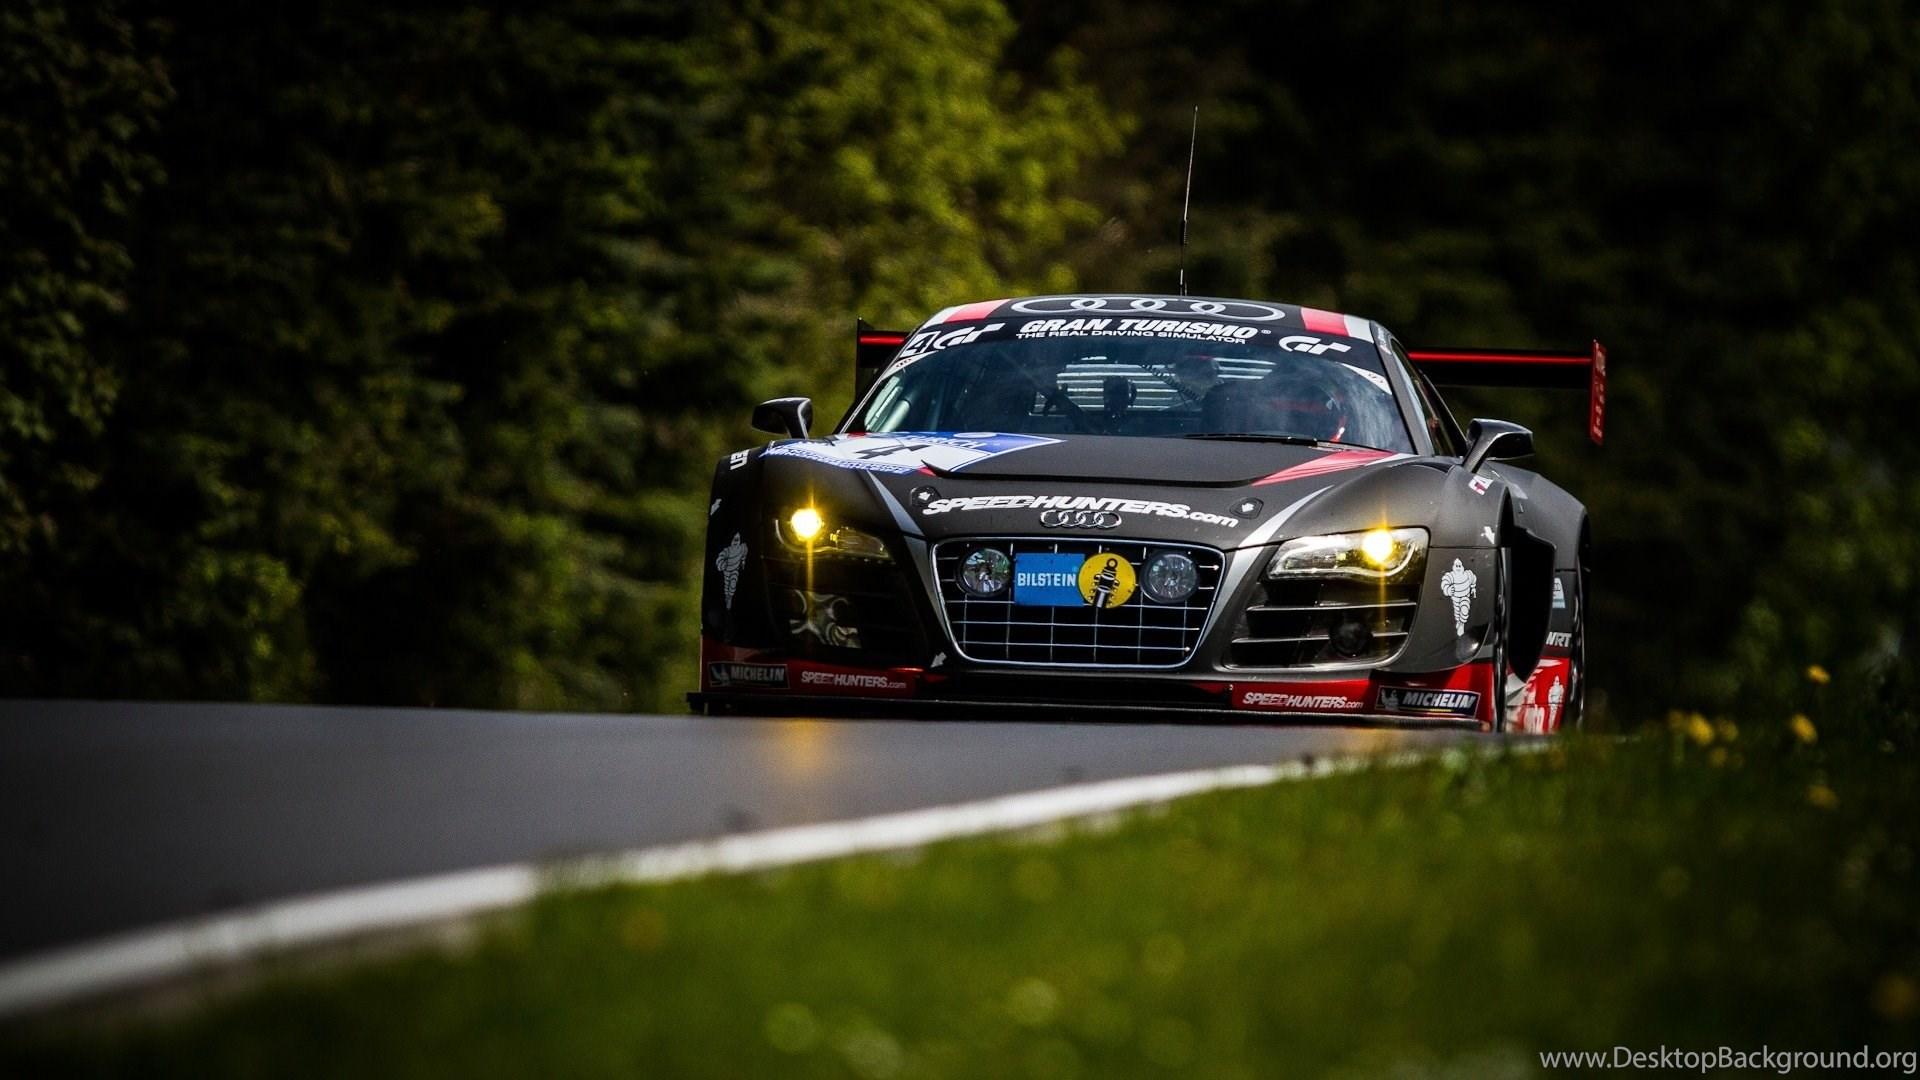 Sample Race Car Speed Data